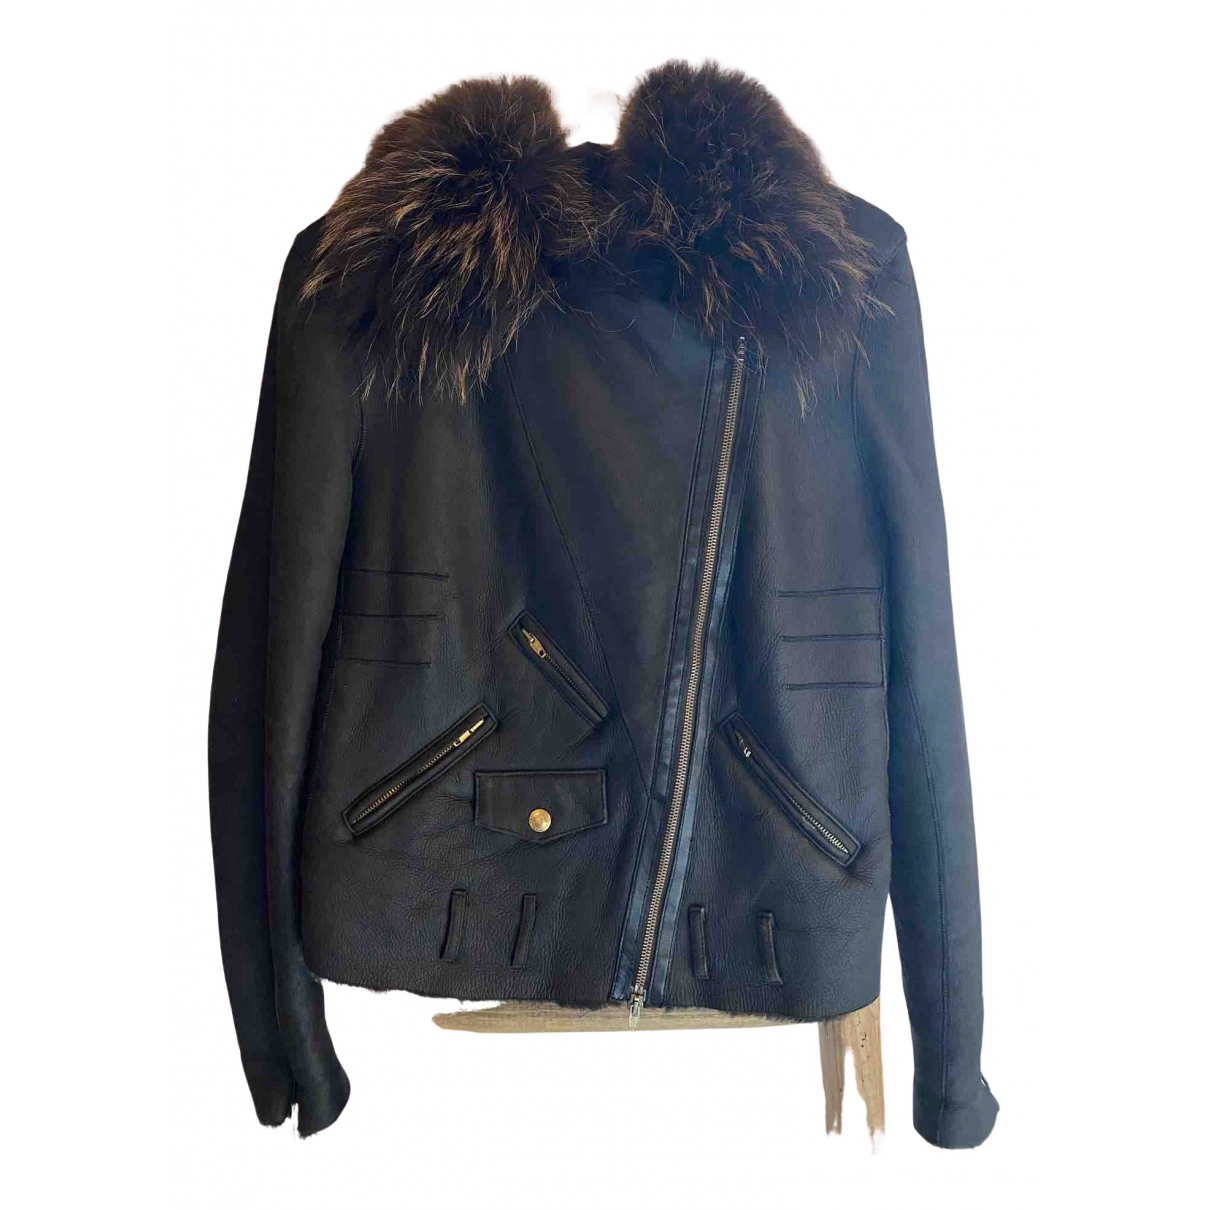 Sonia Rykiel - Manteau   pour femme en cuir - marron